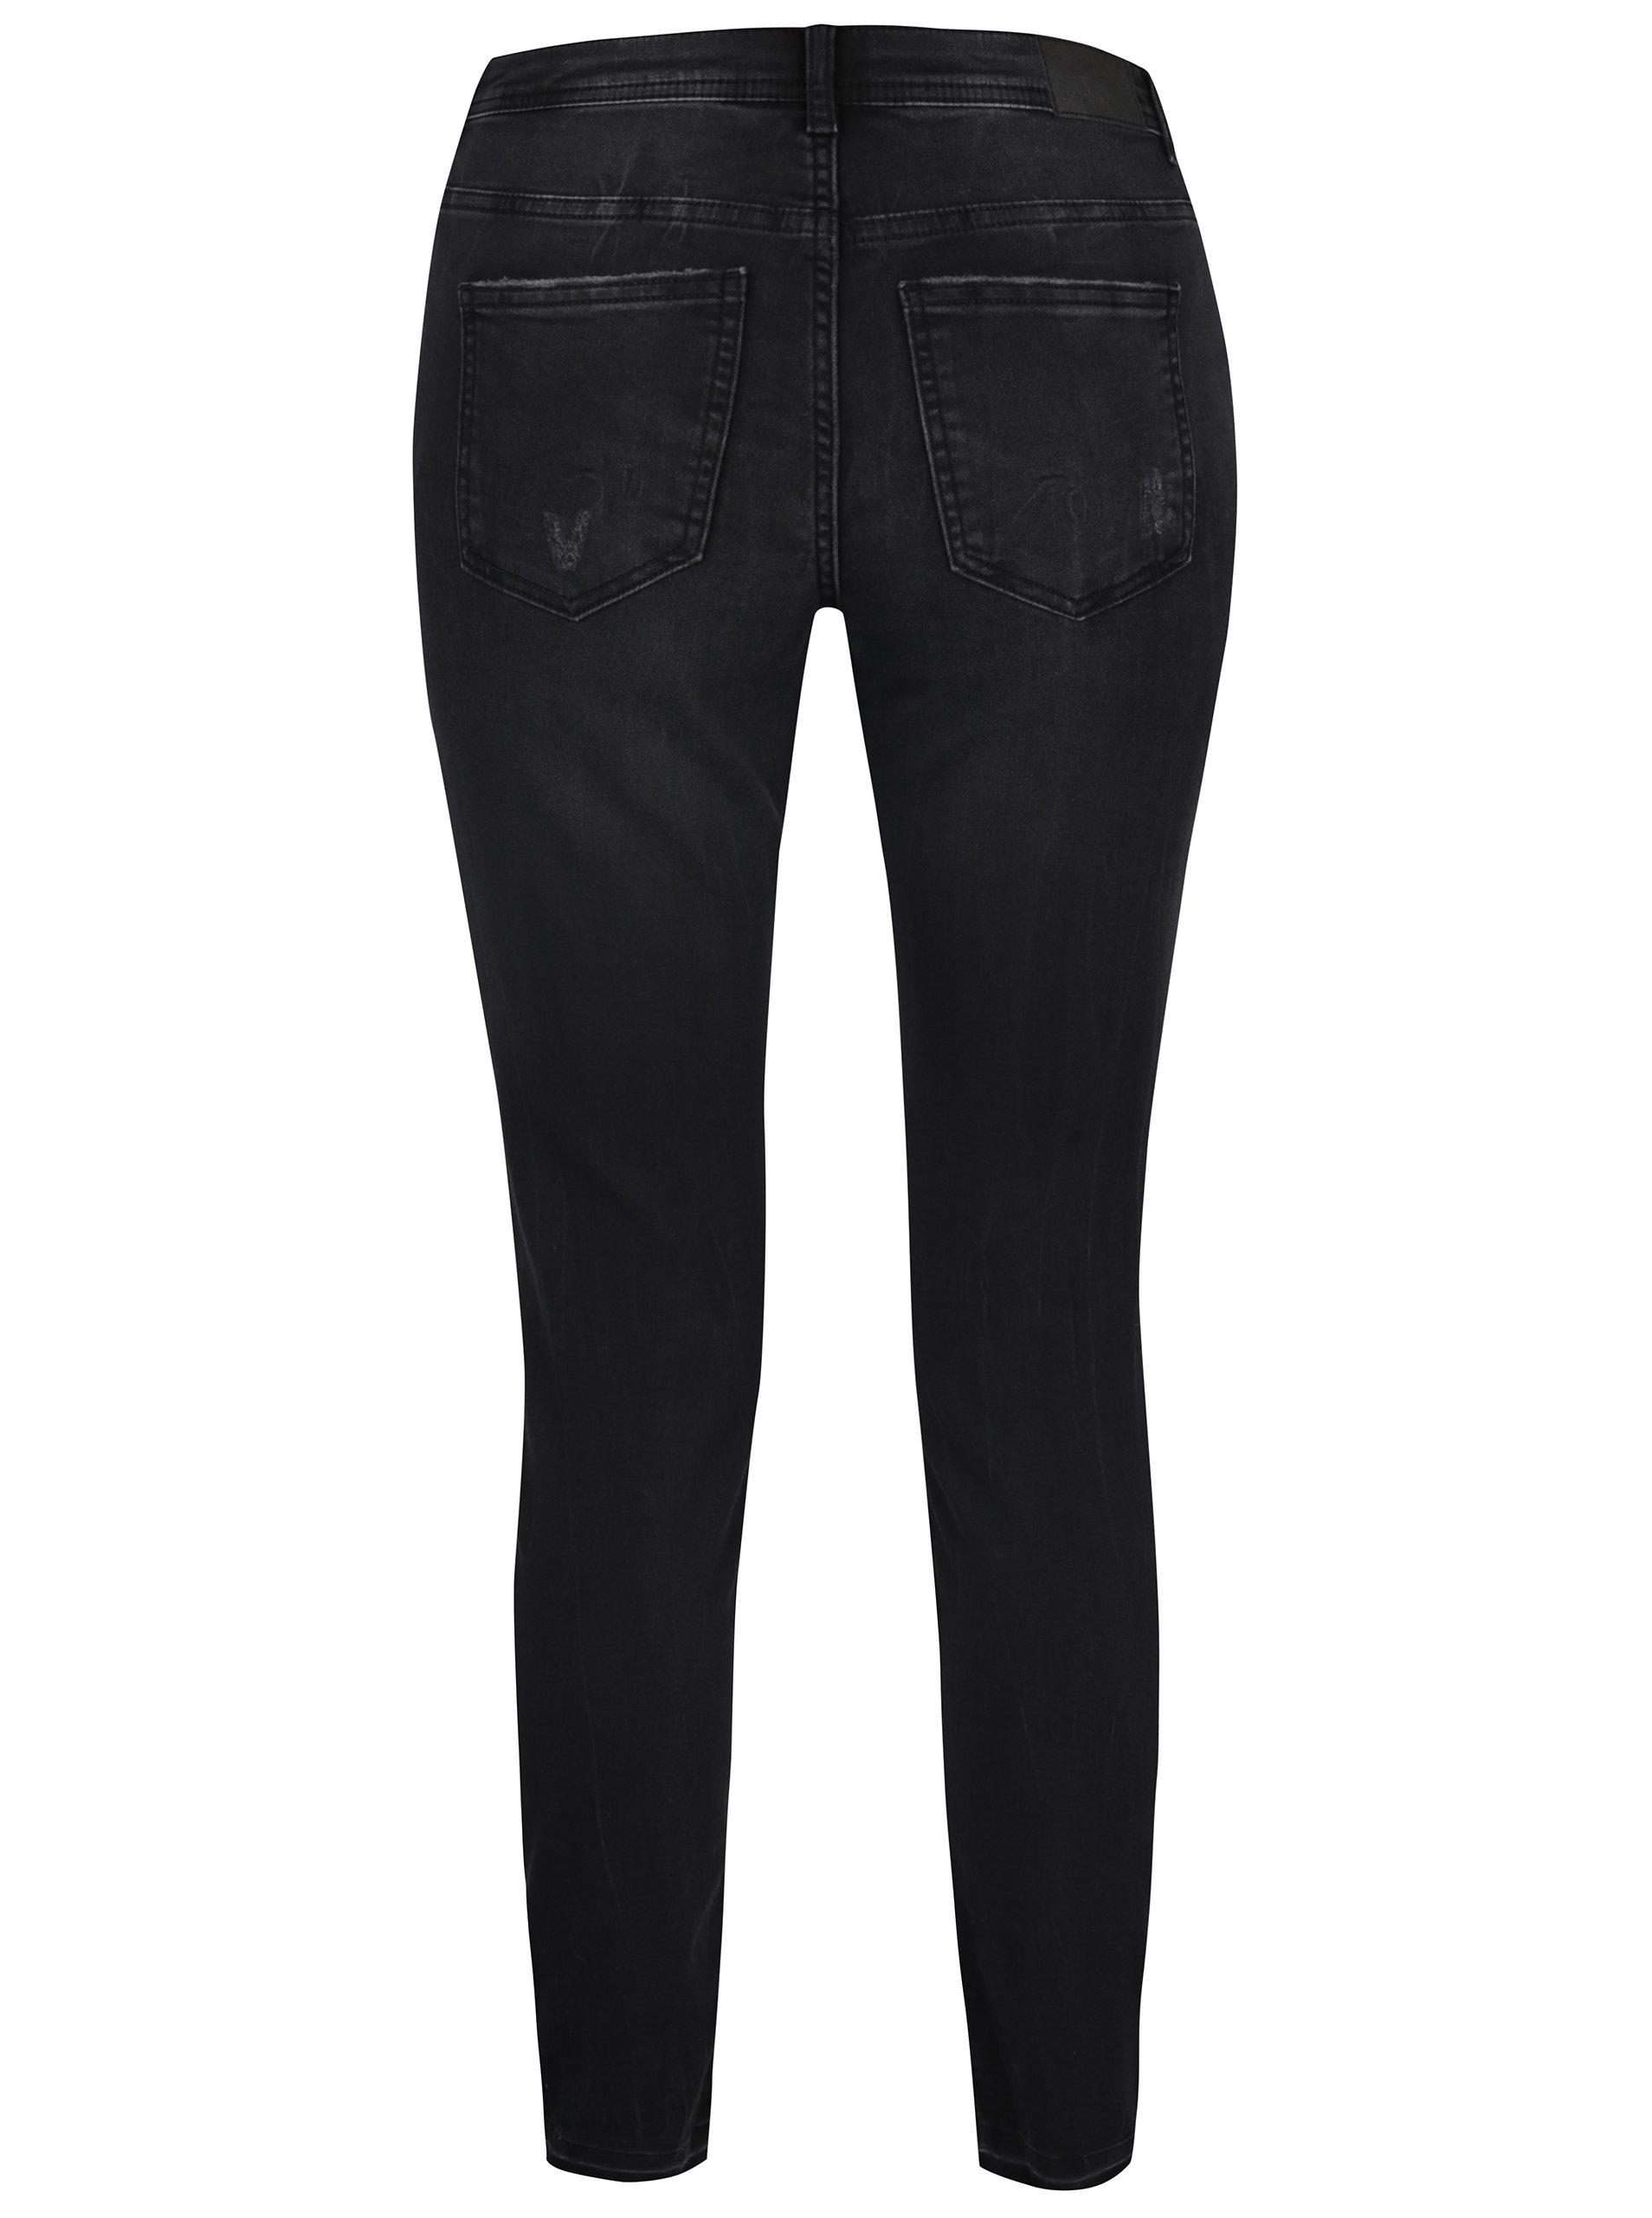 Tmavě šedé skinny džíny s potrhaným efektem Jacqueline de Yong Skinny ... cdbf6ac6c3